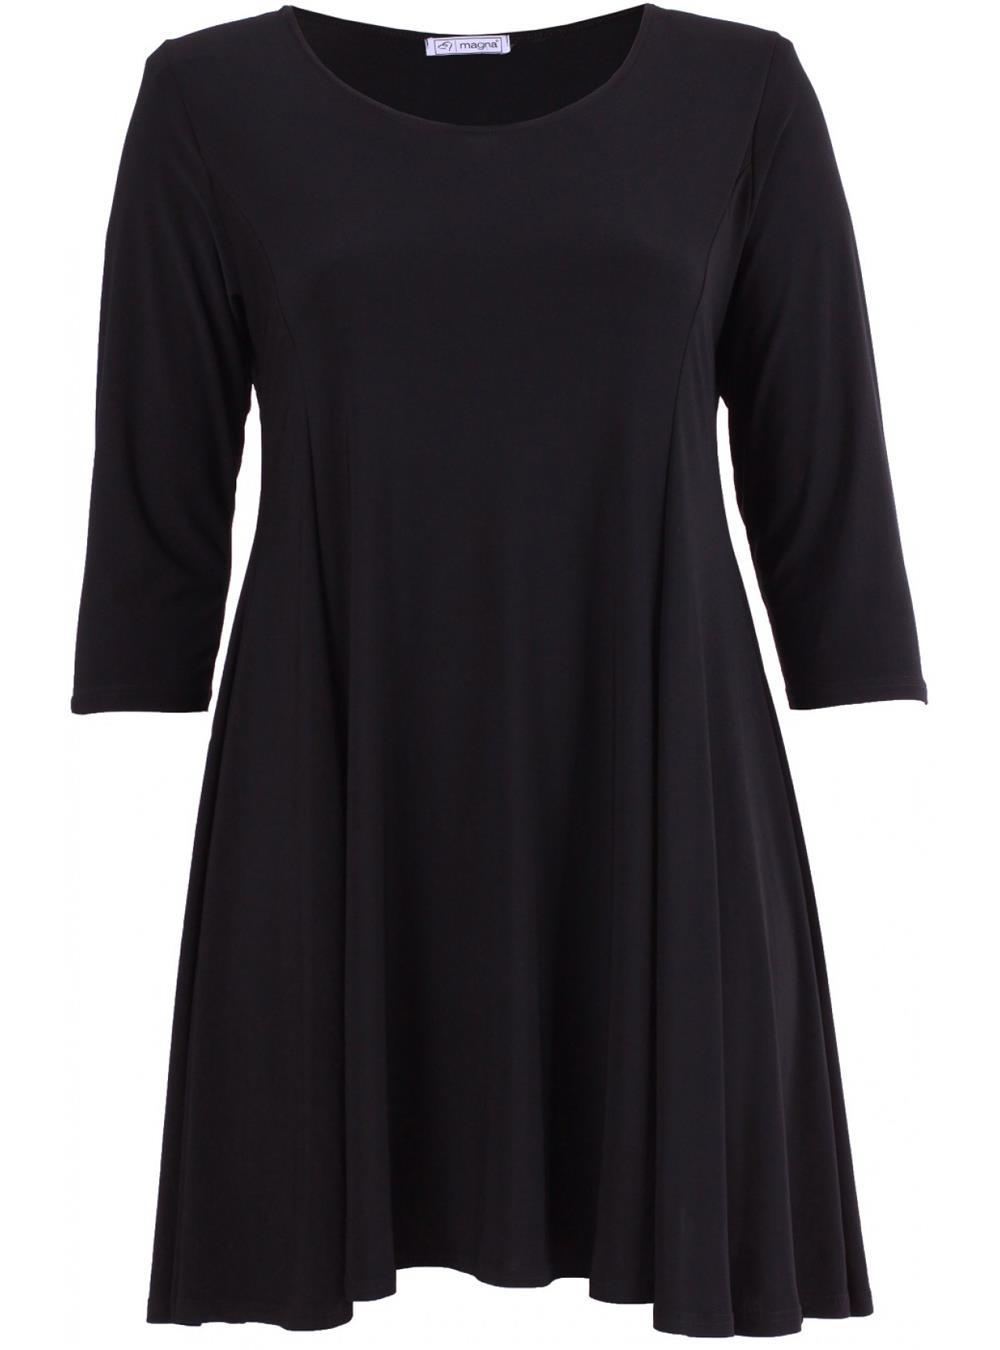 online retailer 2cadc e90d4 Tunika/Kjole, Sort